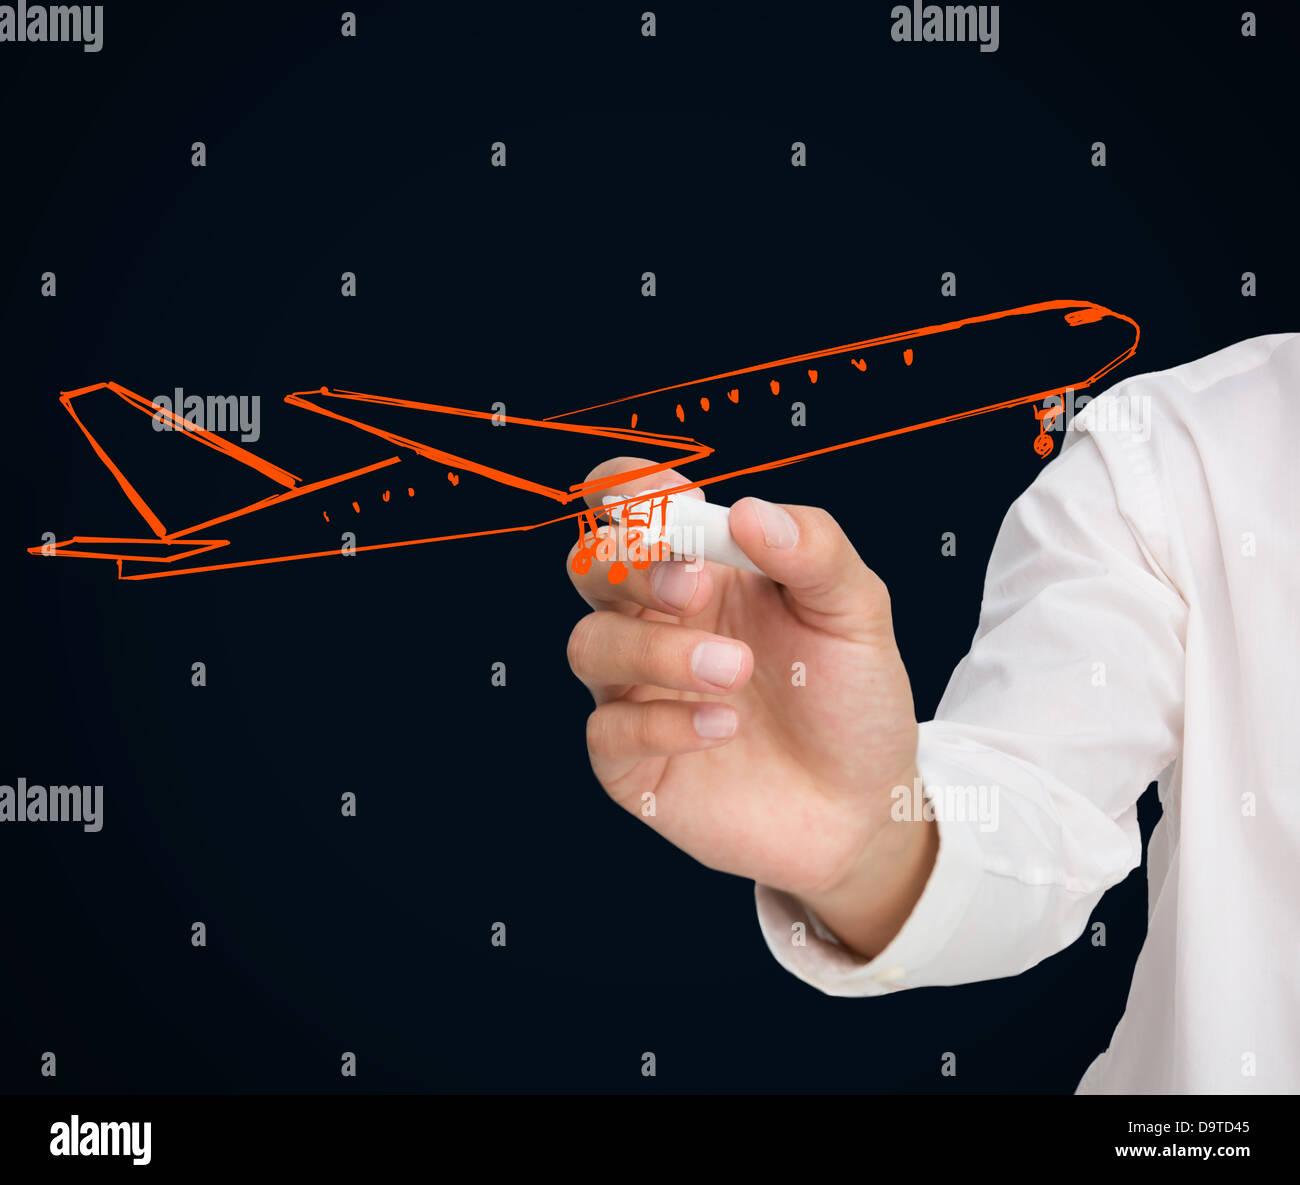 Buisnessman drawing orange airplane - Stock Image